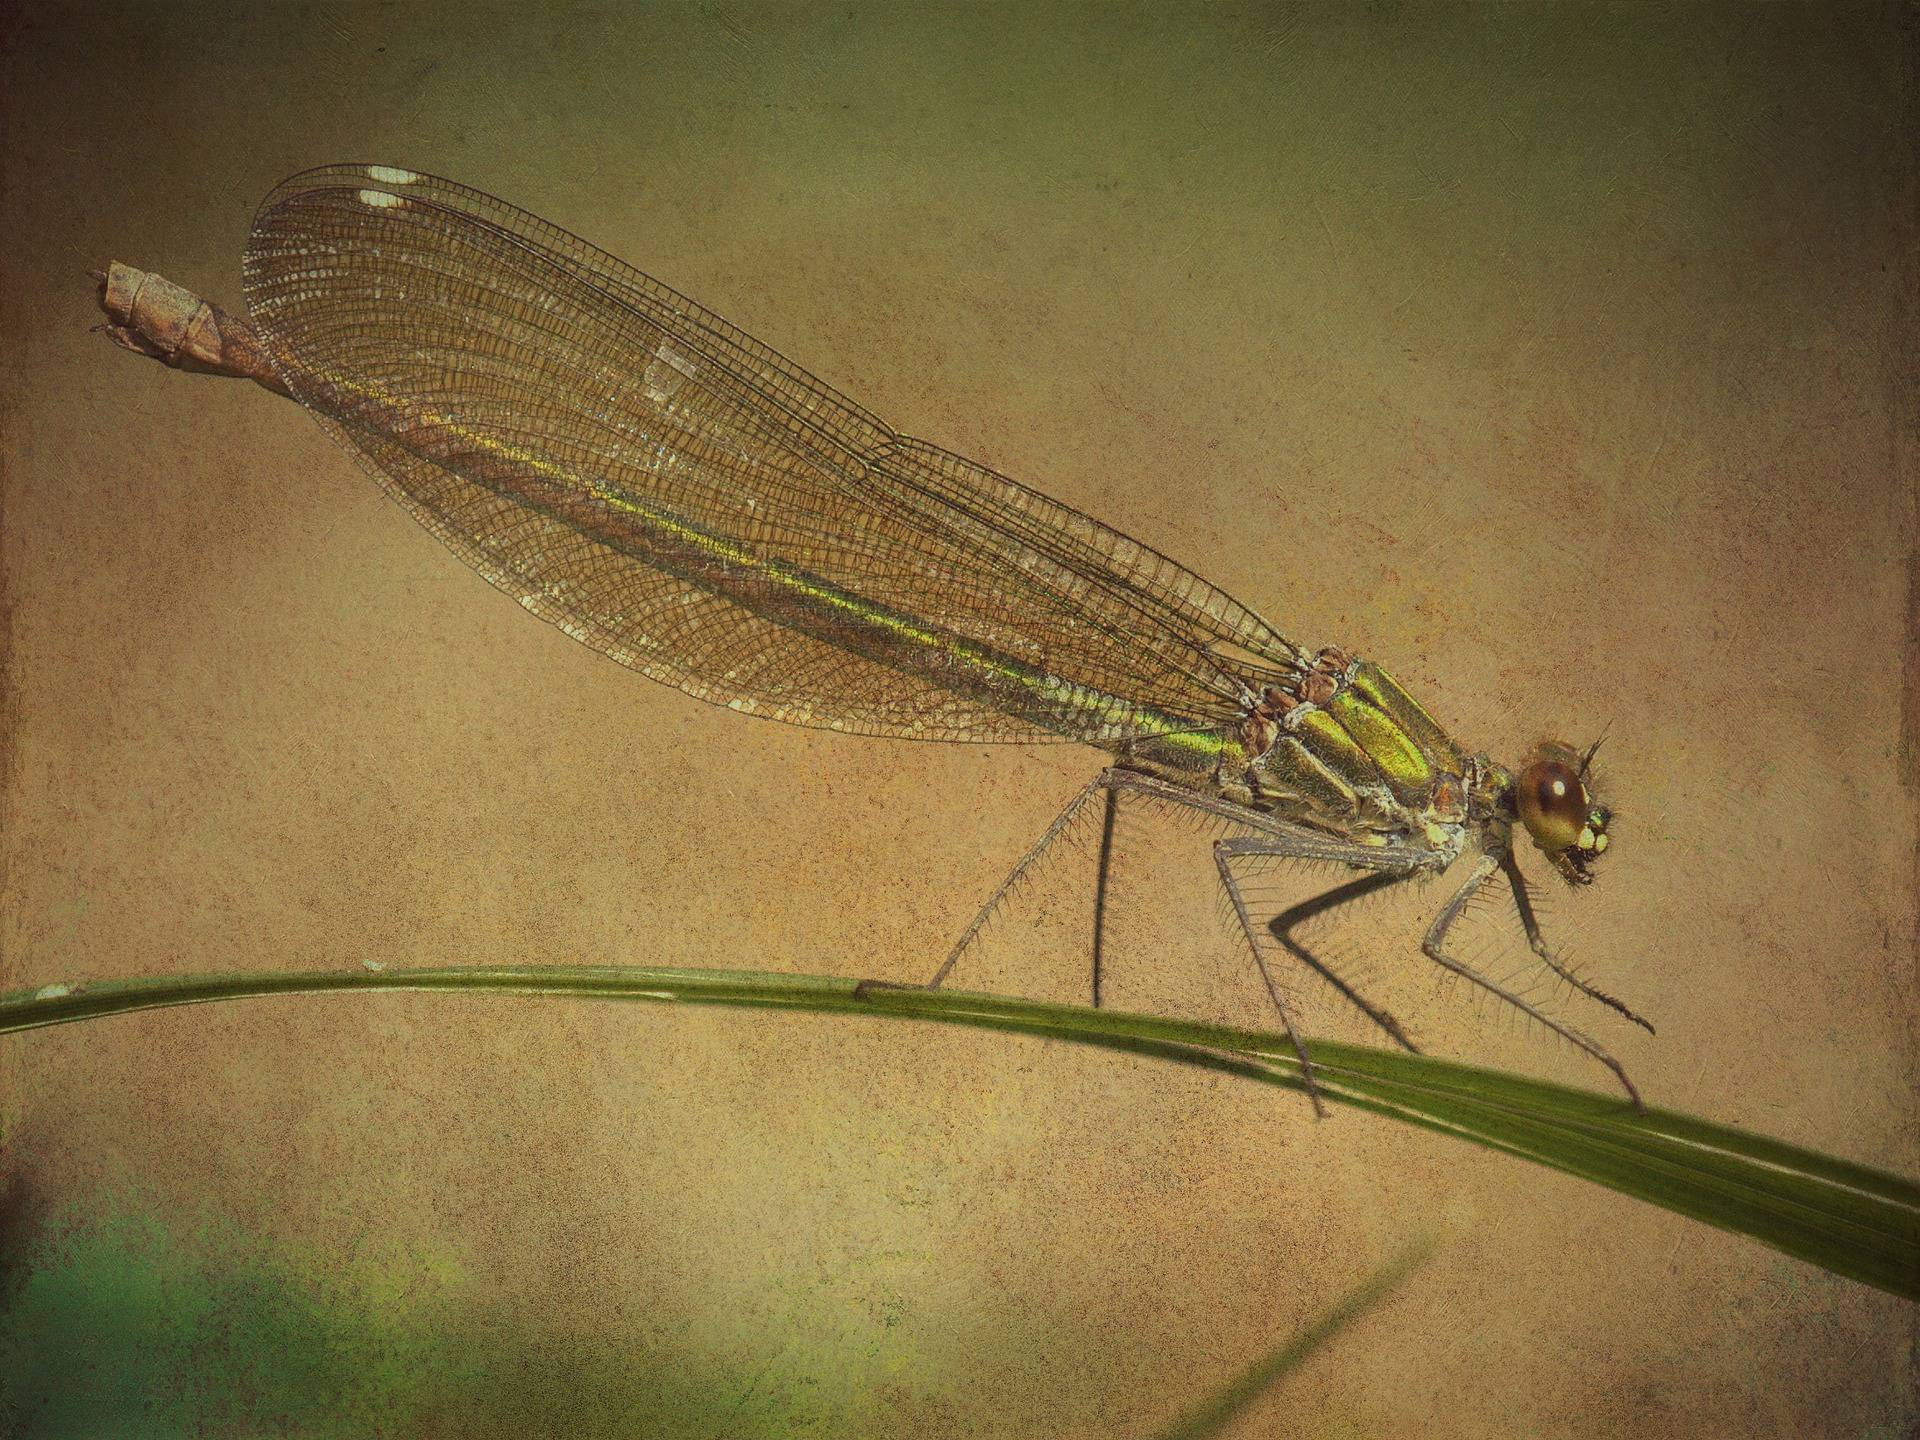 Krafttier Libelle – Symbolik und Bedeutung